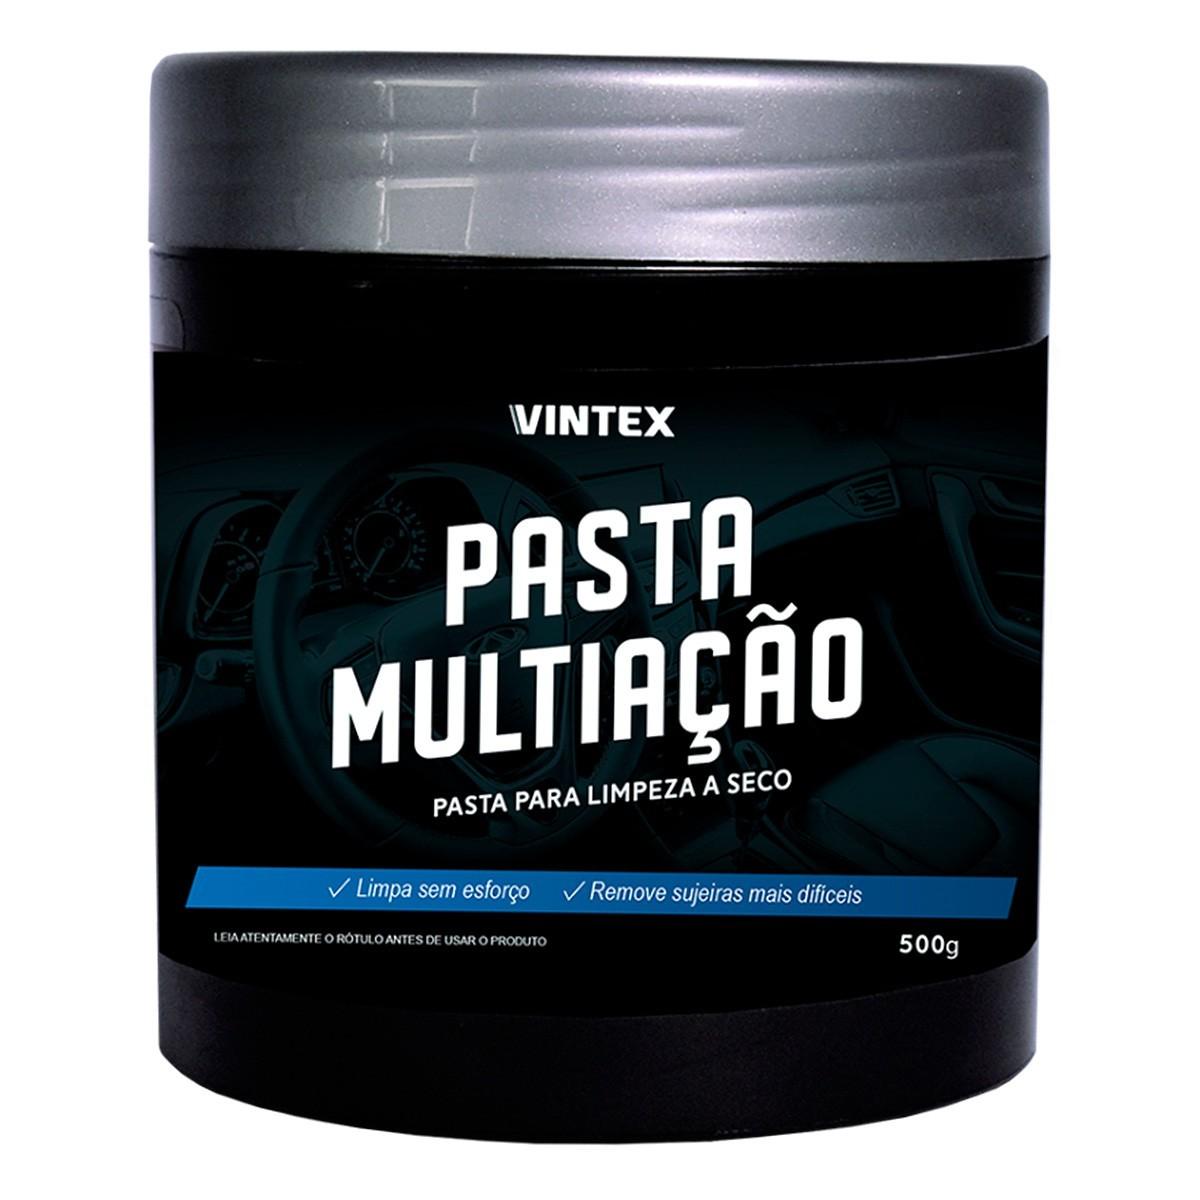 Pasta Multiaçao 500g Vintex By Vonixx